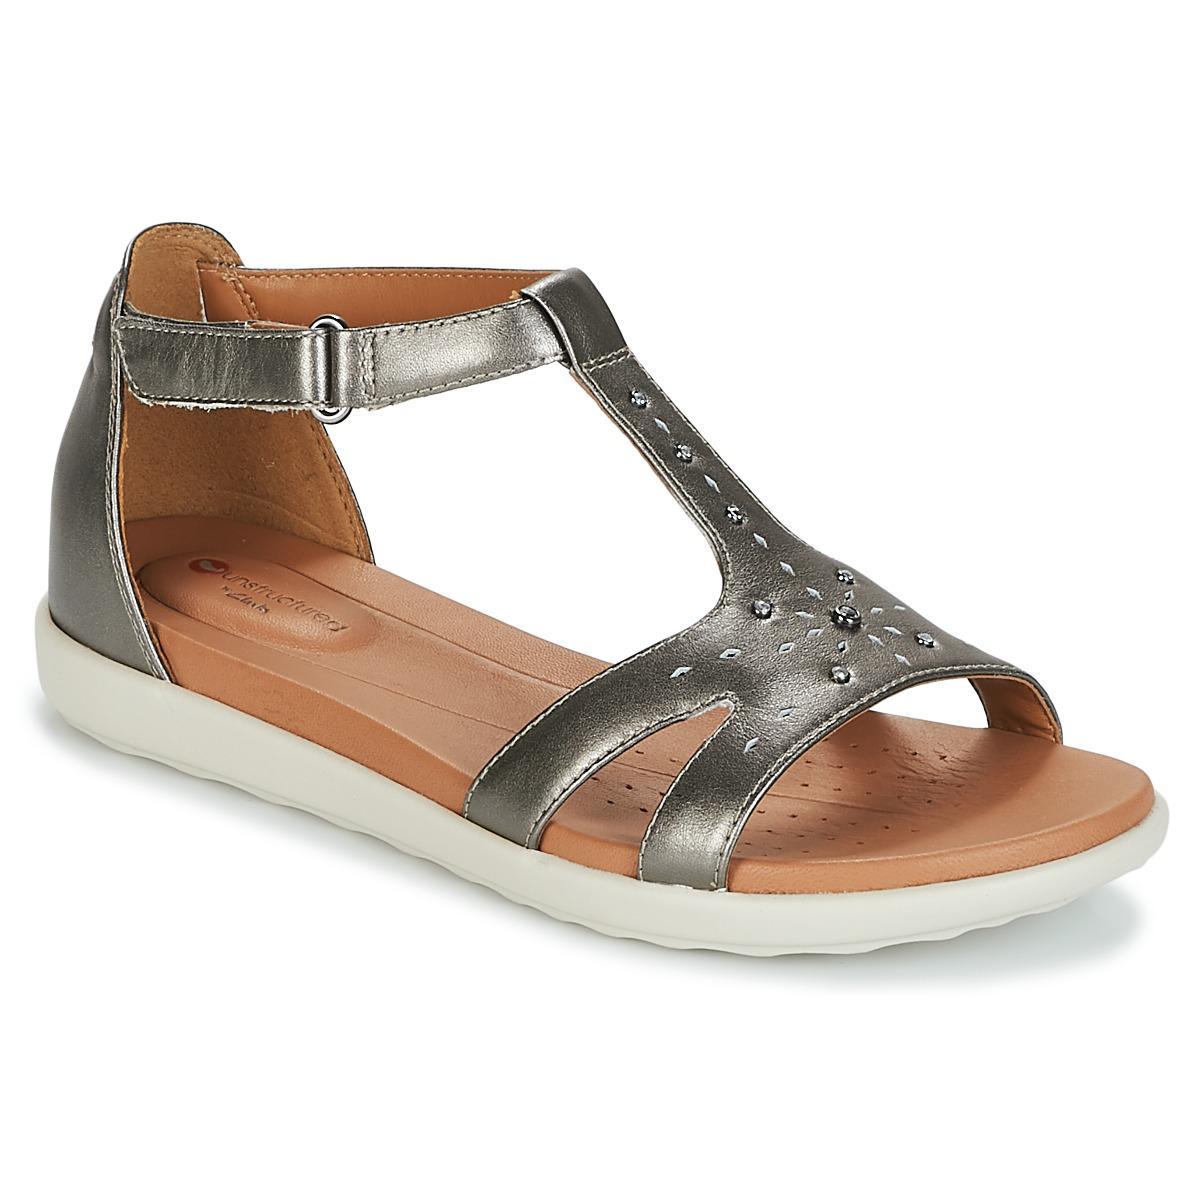 134095c92b4ed7 Clarks Un Reisel Mara Sandals in Metallic - Lyst